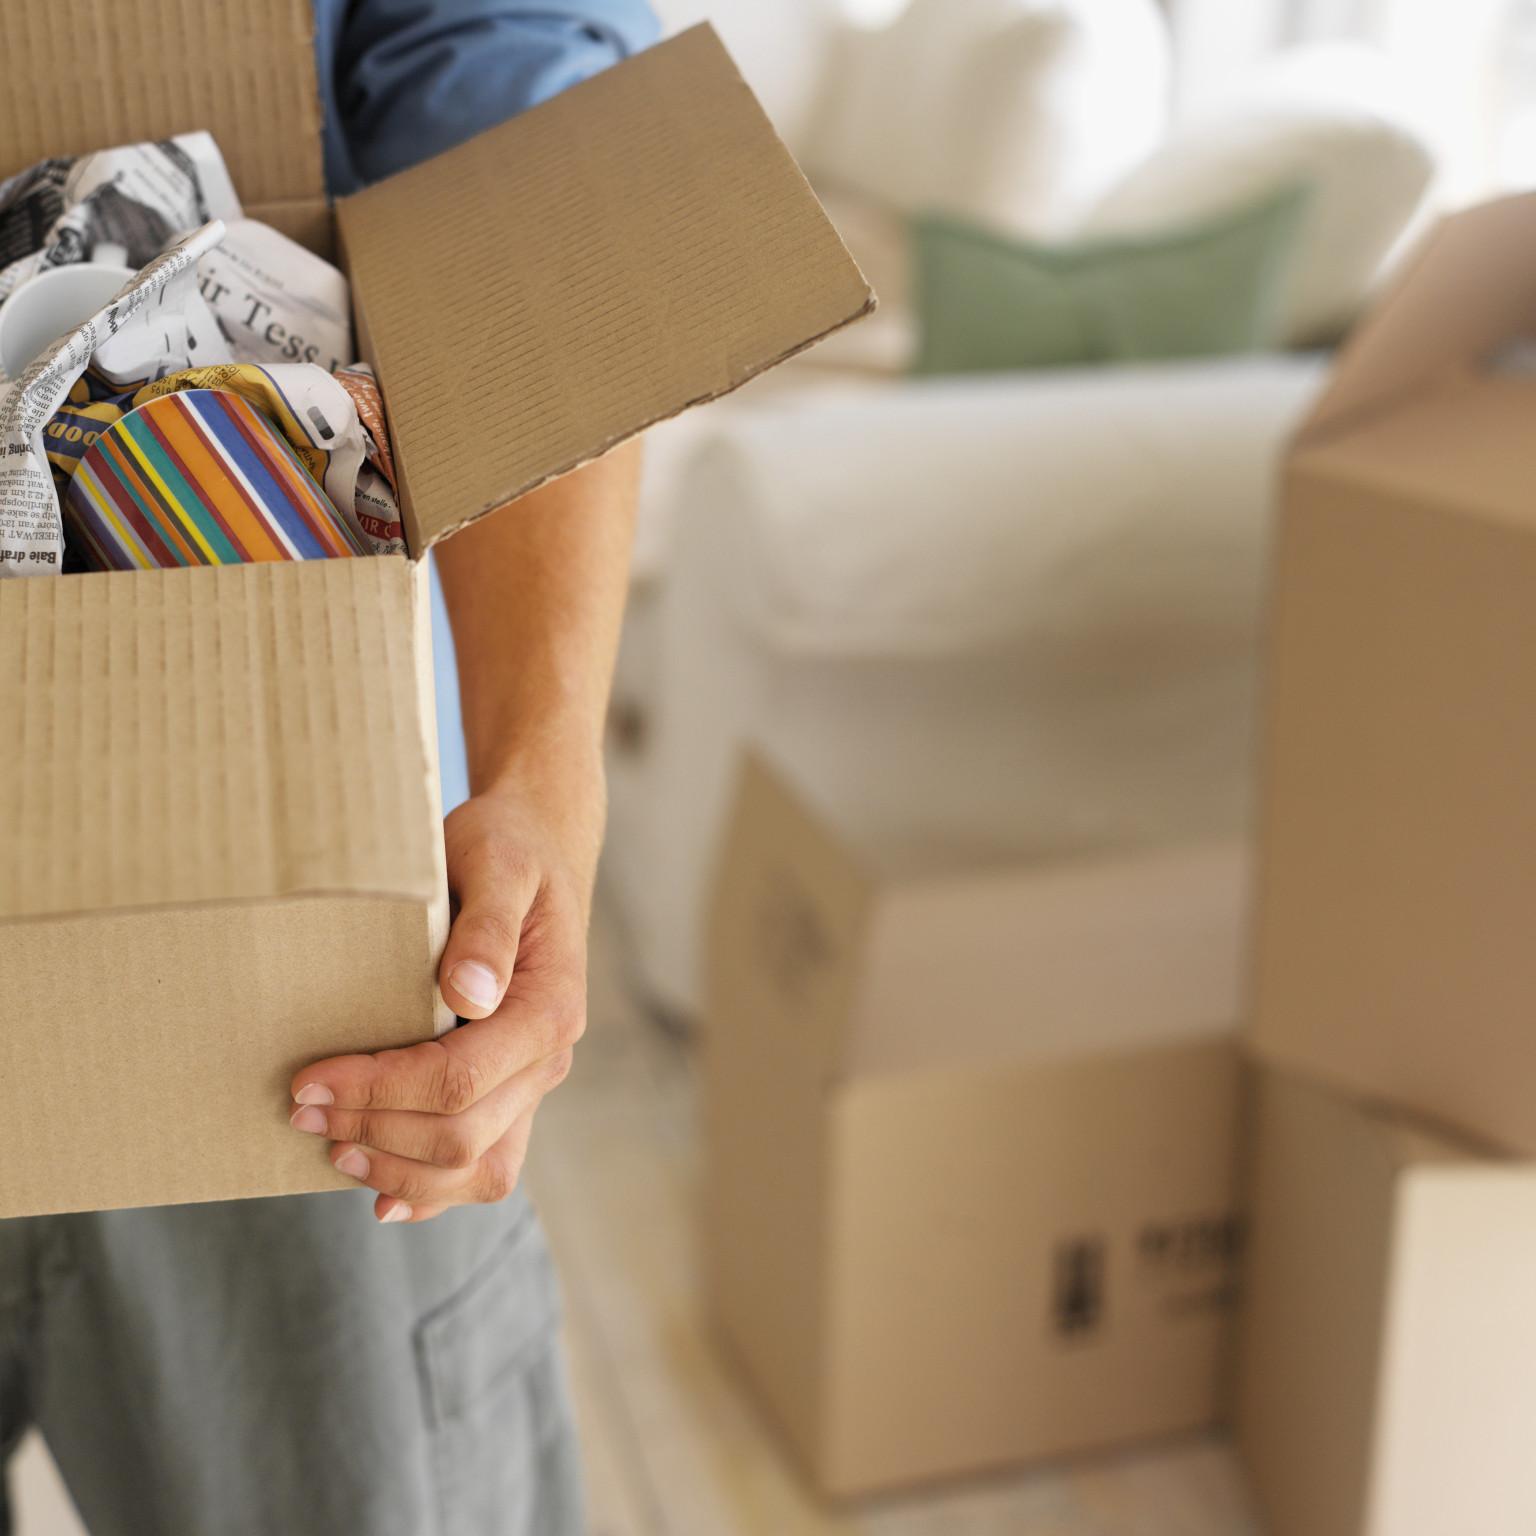 Предусмотрена ли у вас упаковка вещей перед переездом?